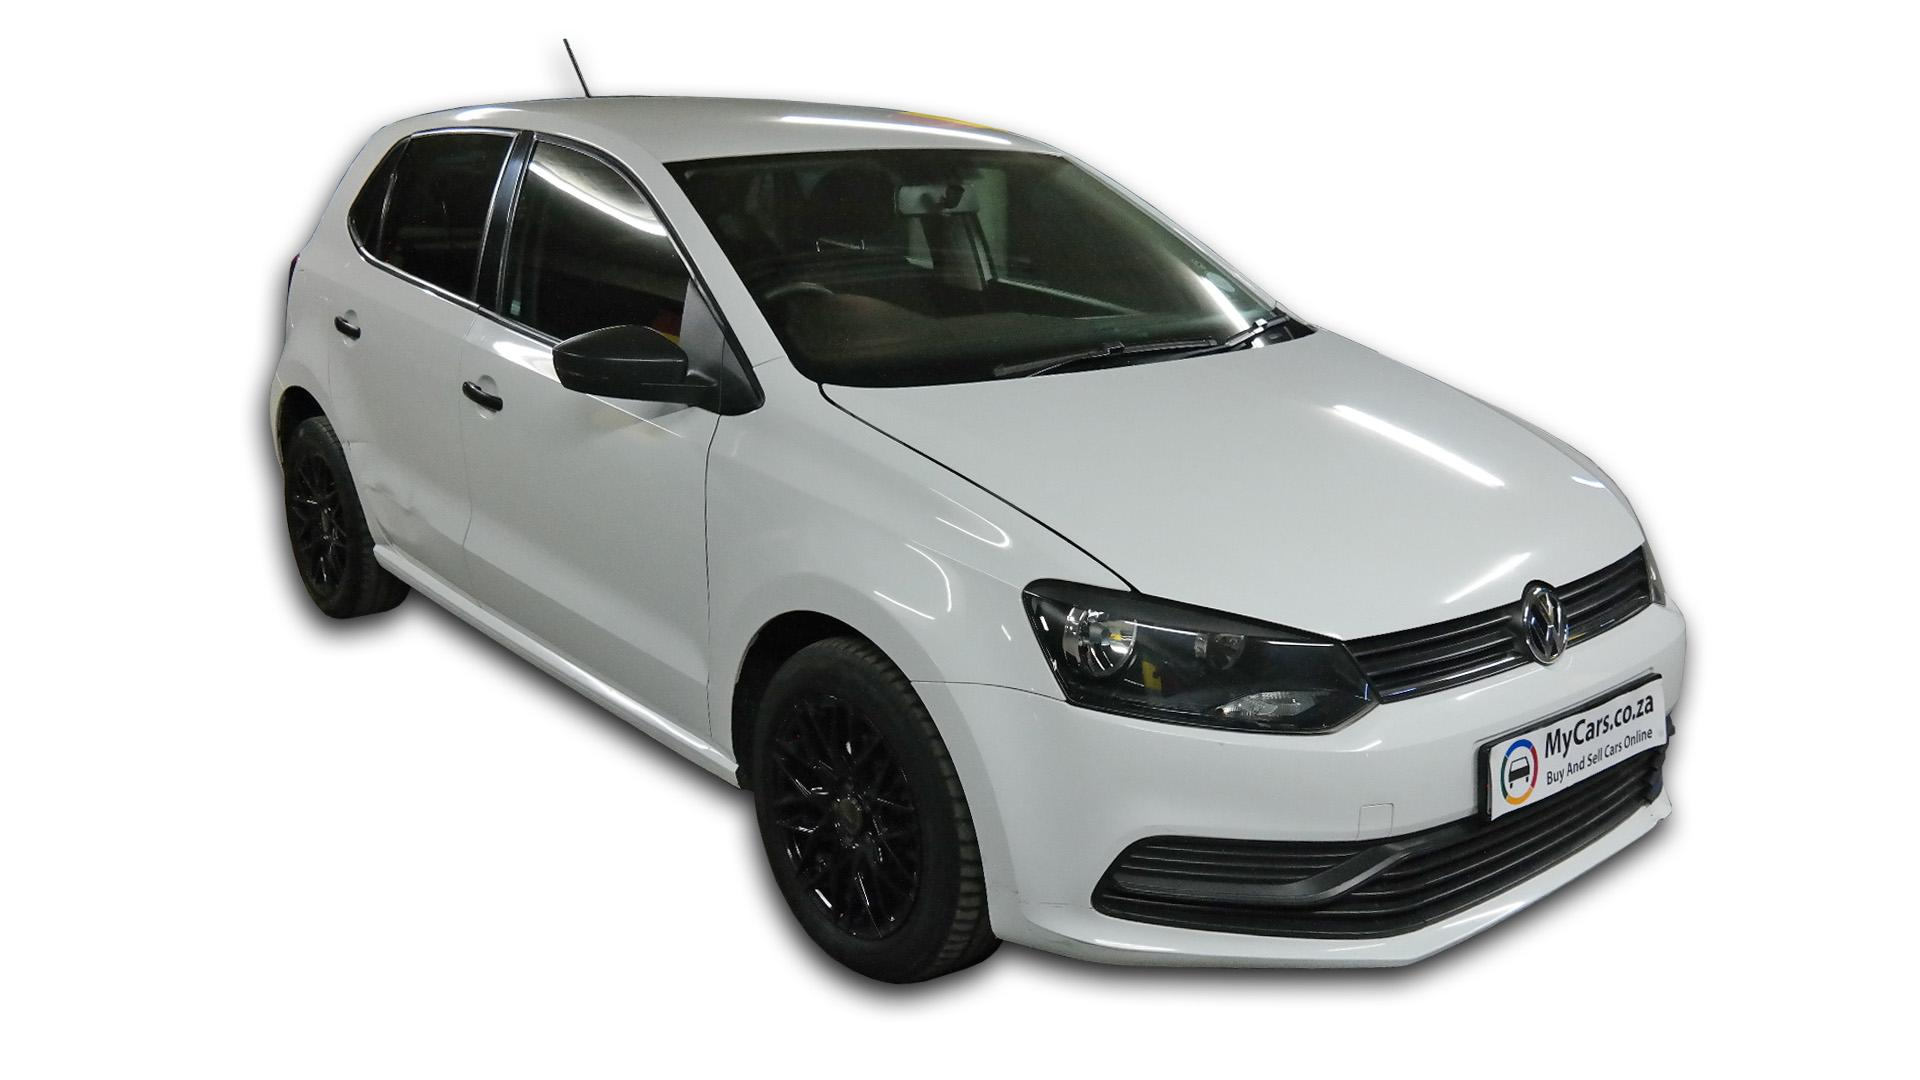 Volkswagen Polo Vivo 1.2 Tsi Trendline